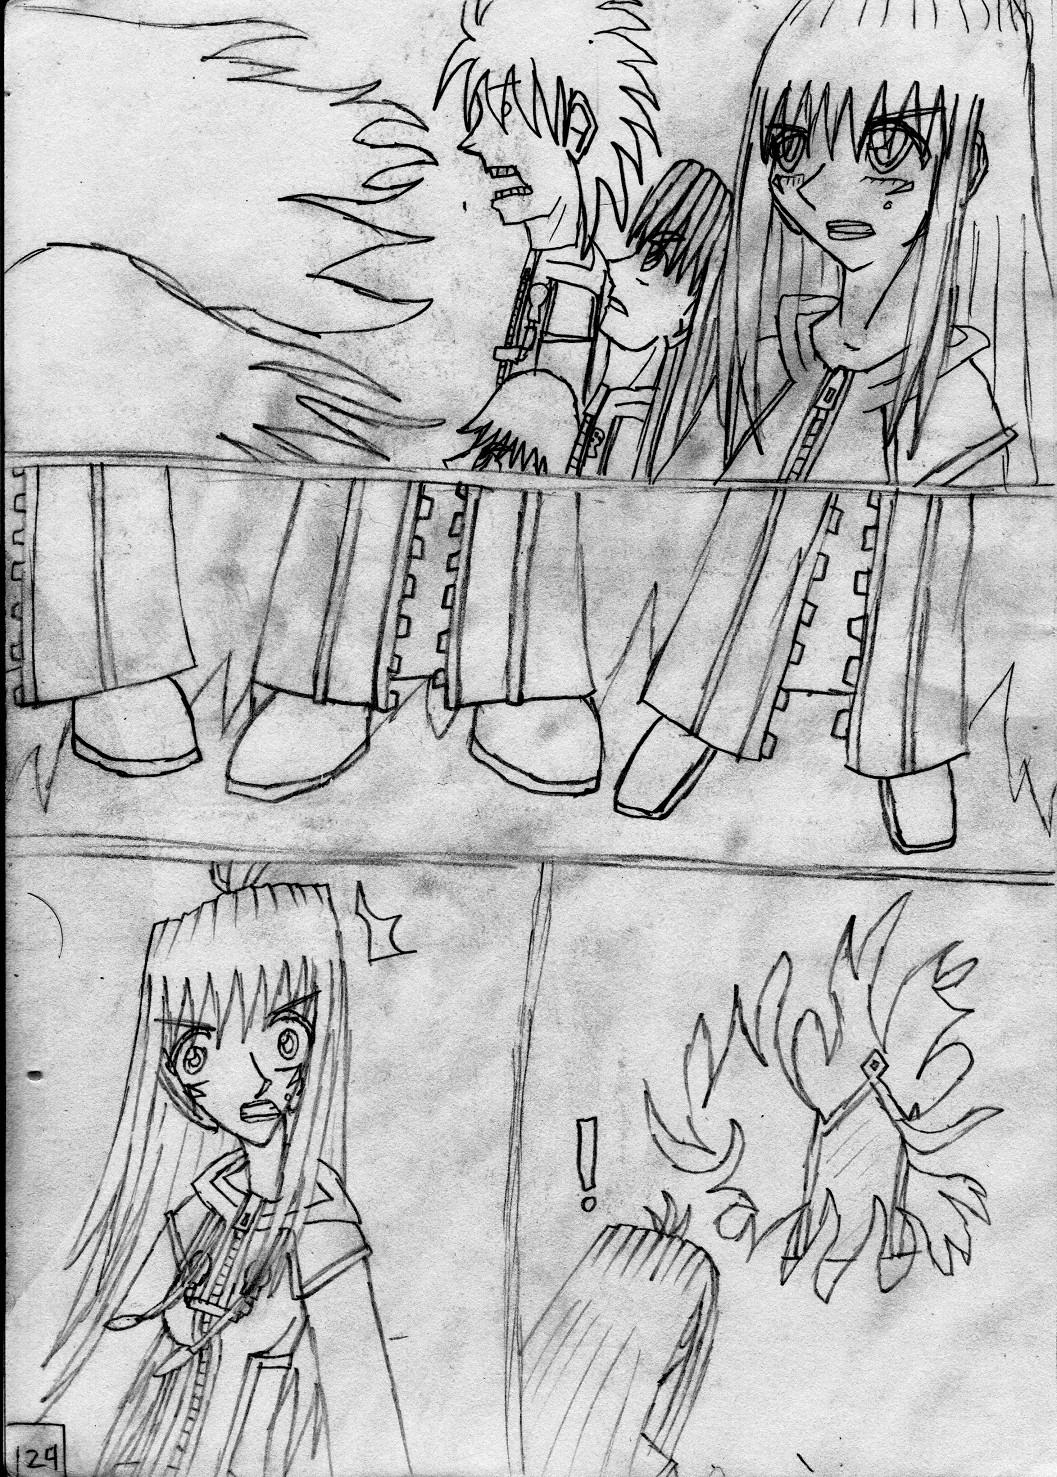 Kingdom Hearts Destined Waltz Page 124 by NIX